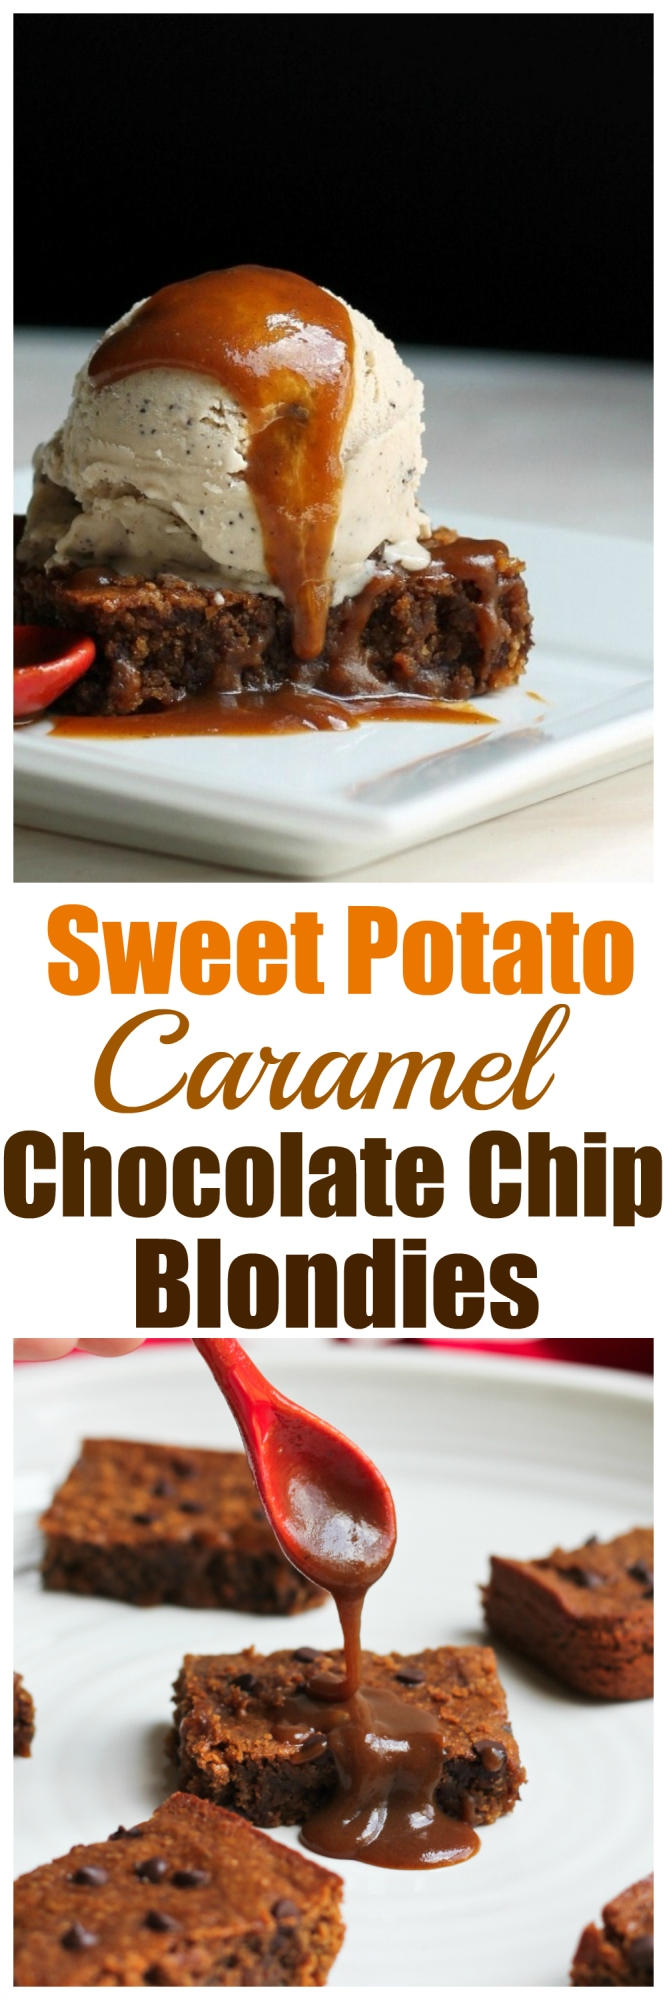 Sweet Potato Caramel Chocolate Chip Blondies (Vegan & Gluten-free)